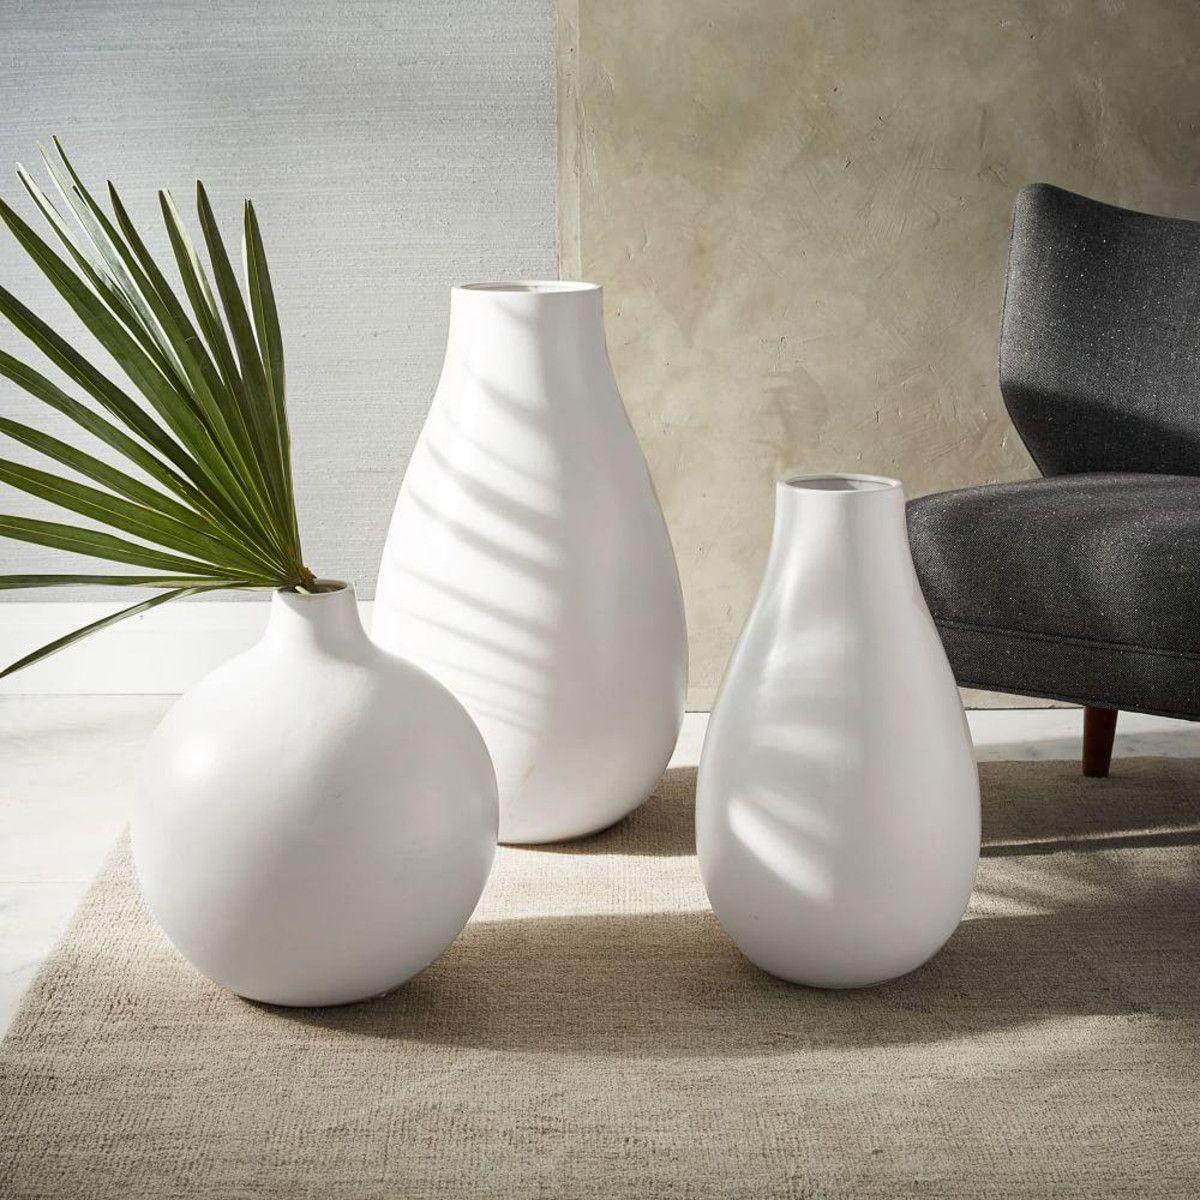 Oversized Pure White Ceramic Vases White ceramic vases